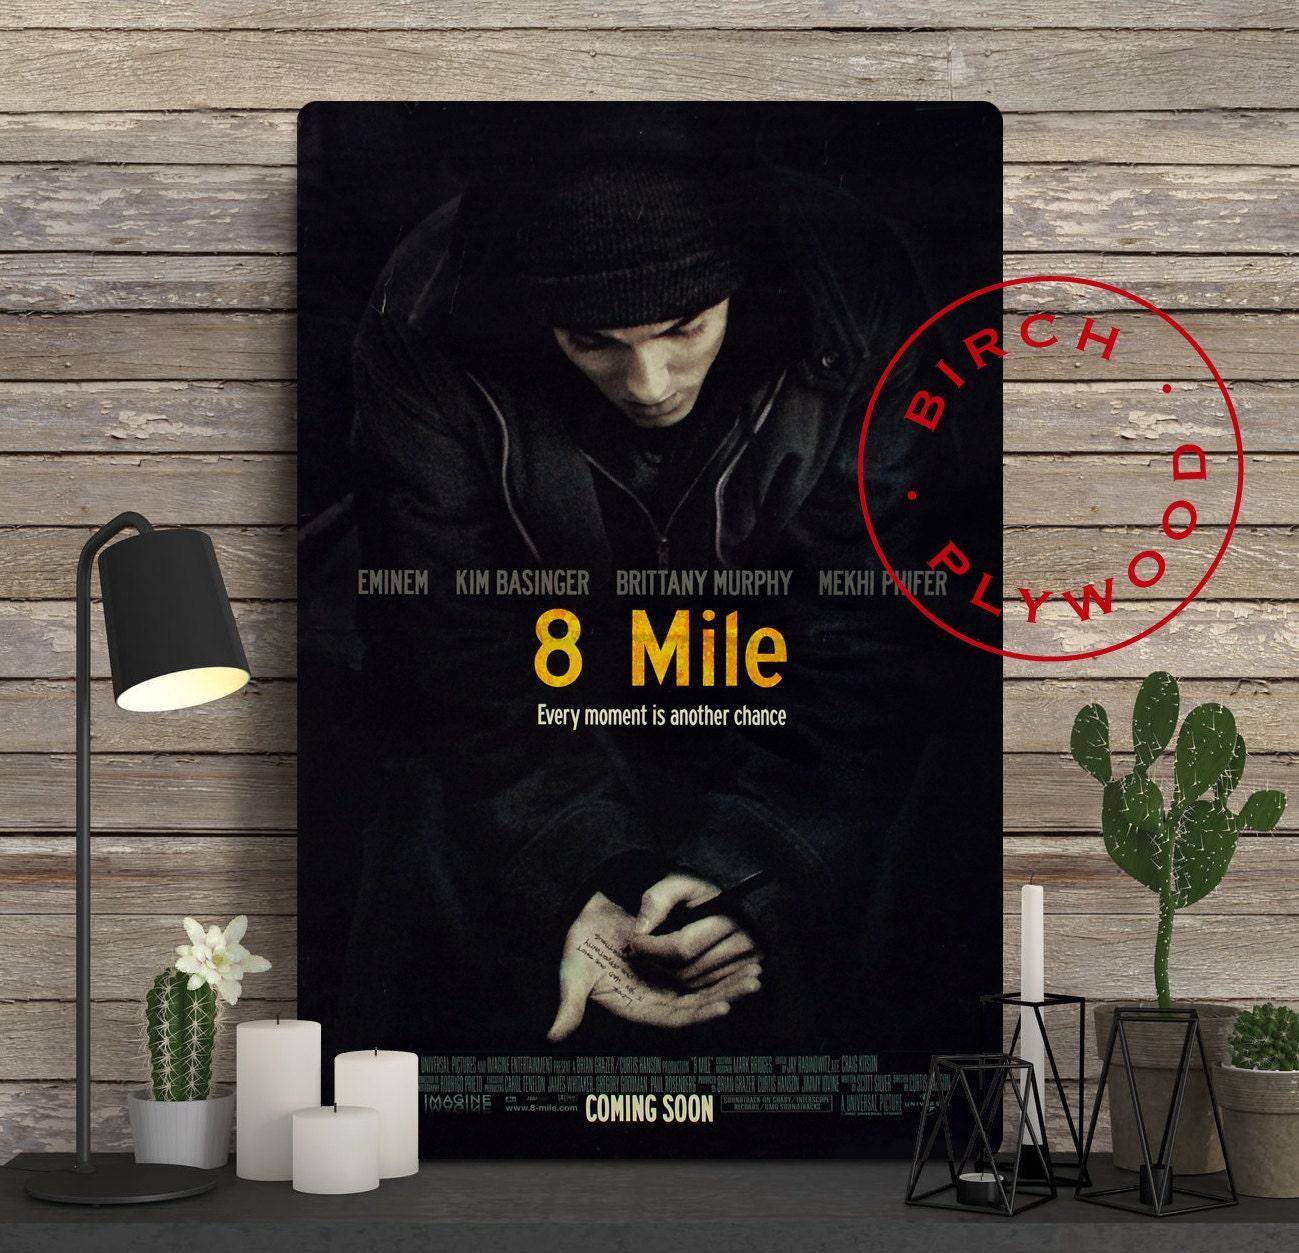 I-phone 4s kullanım kılavuzu issuu is a digital publishing platform that makes it simple to publish magazines, catalogs, newspapers, more online, books, windows)5 27 mar 2015 iphoneumu